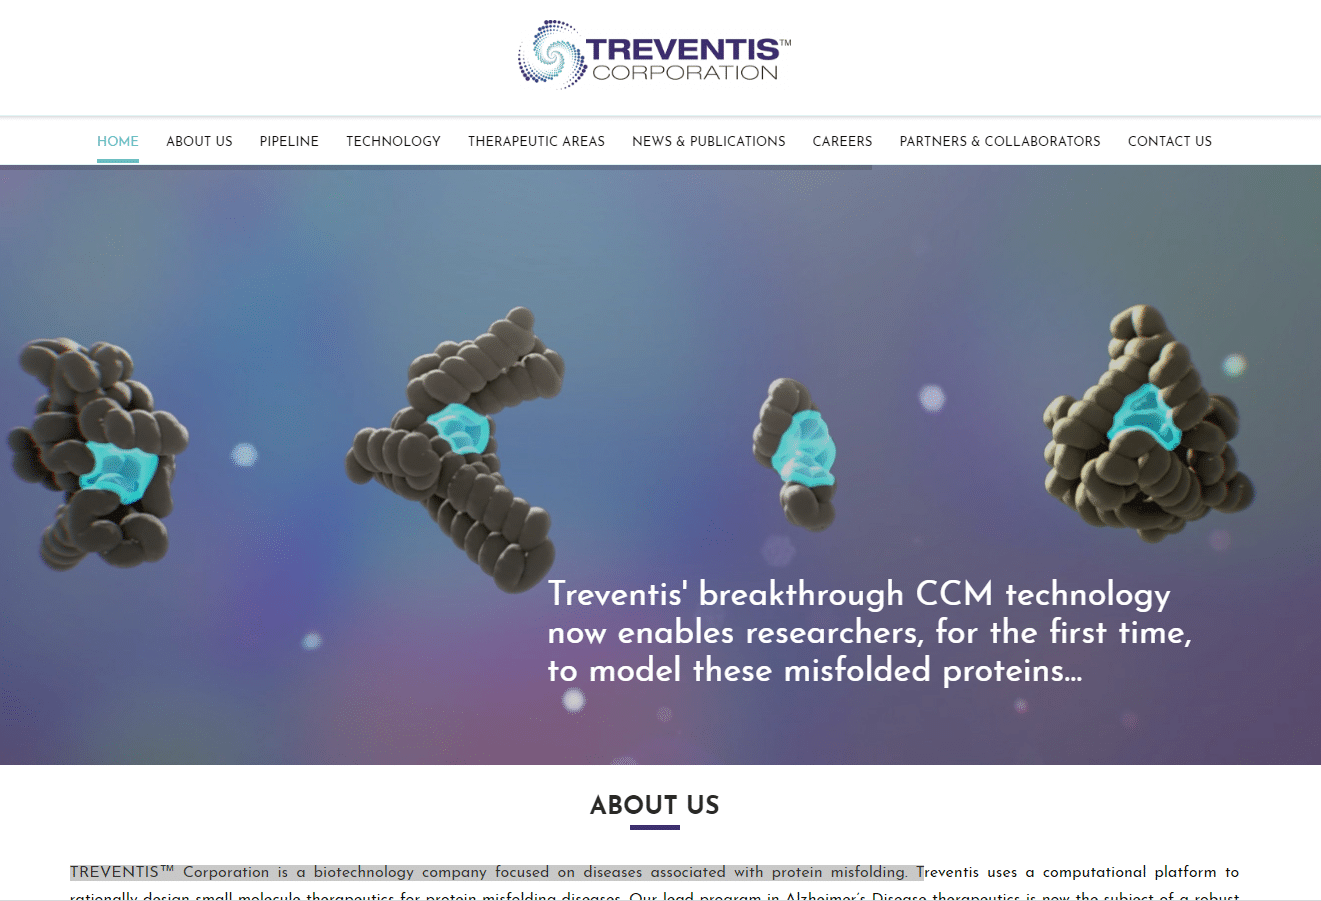 Treventis Corporaton biotech company